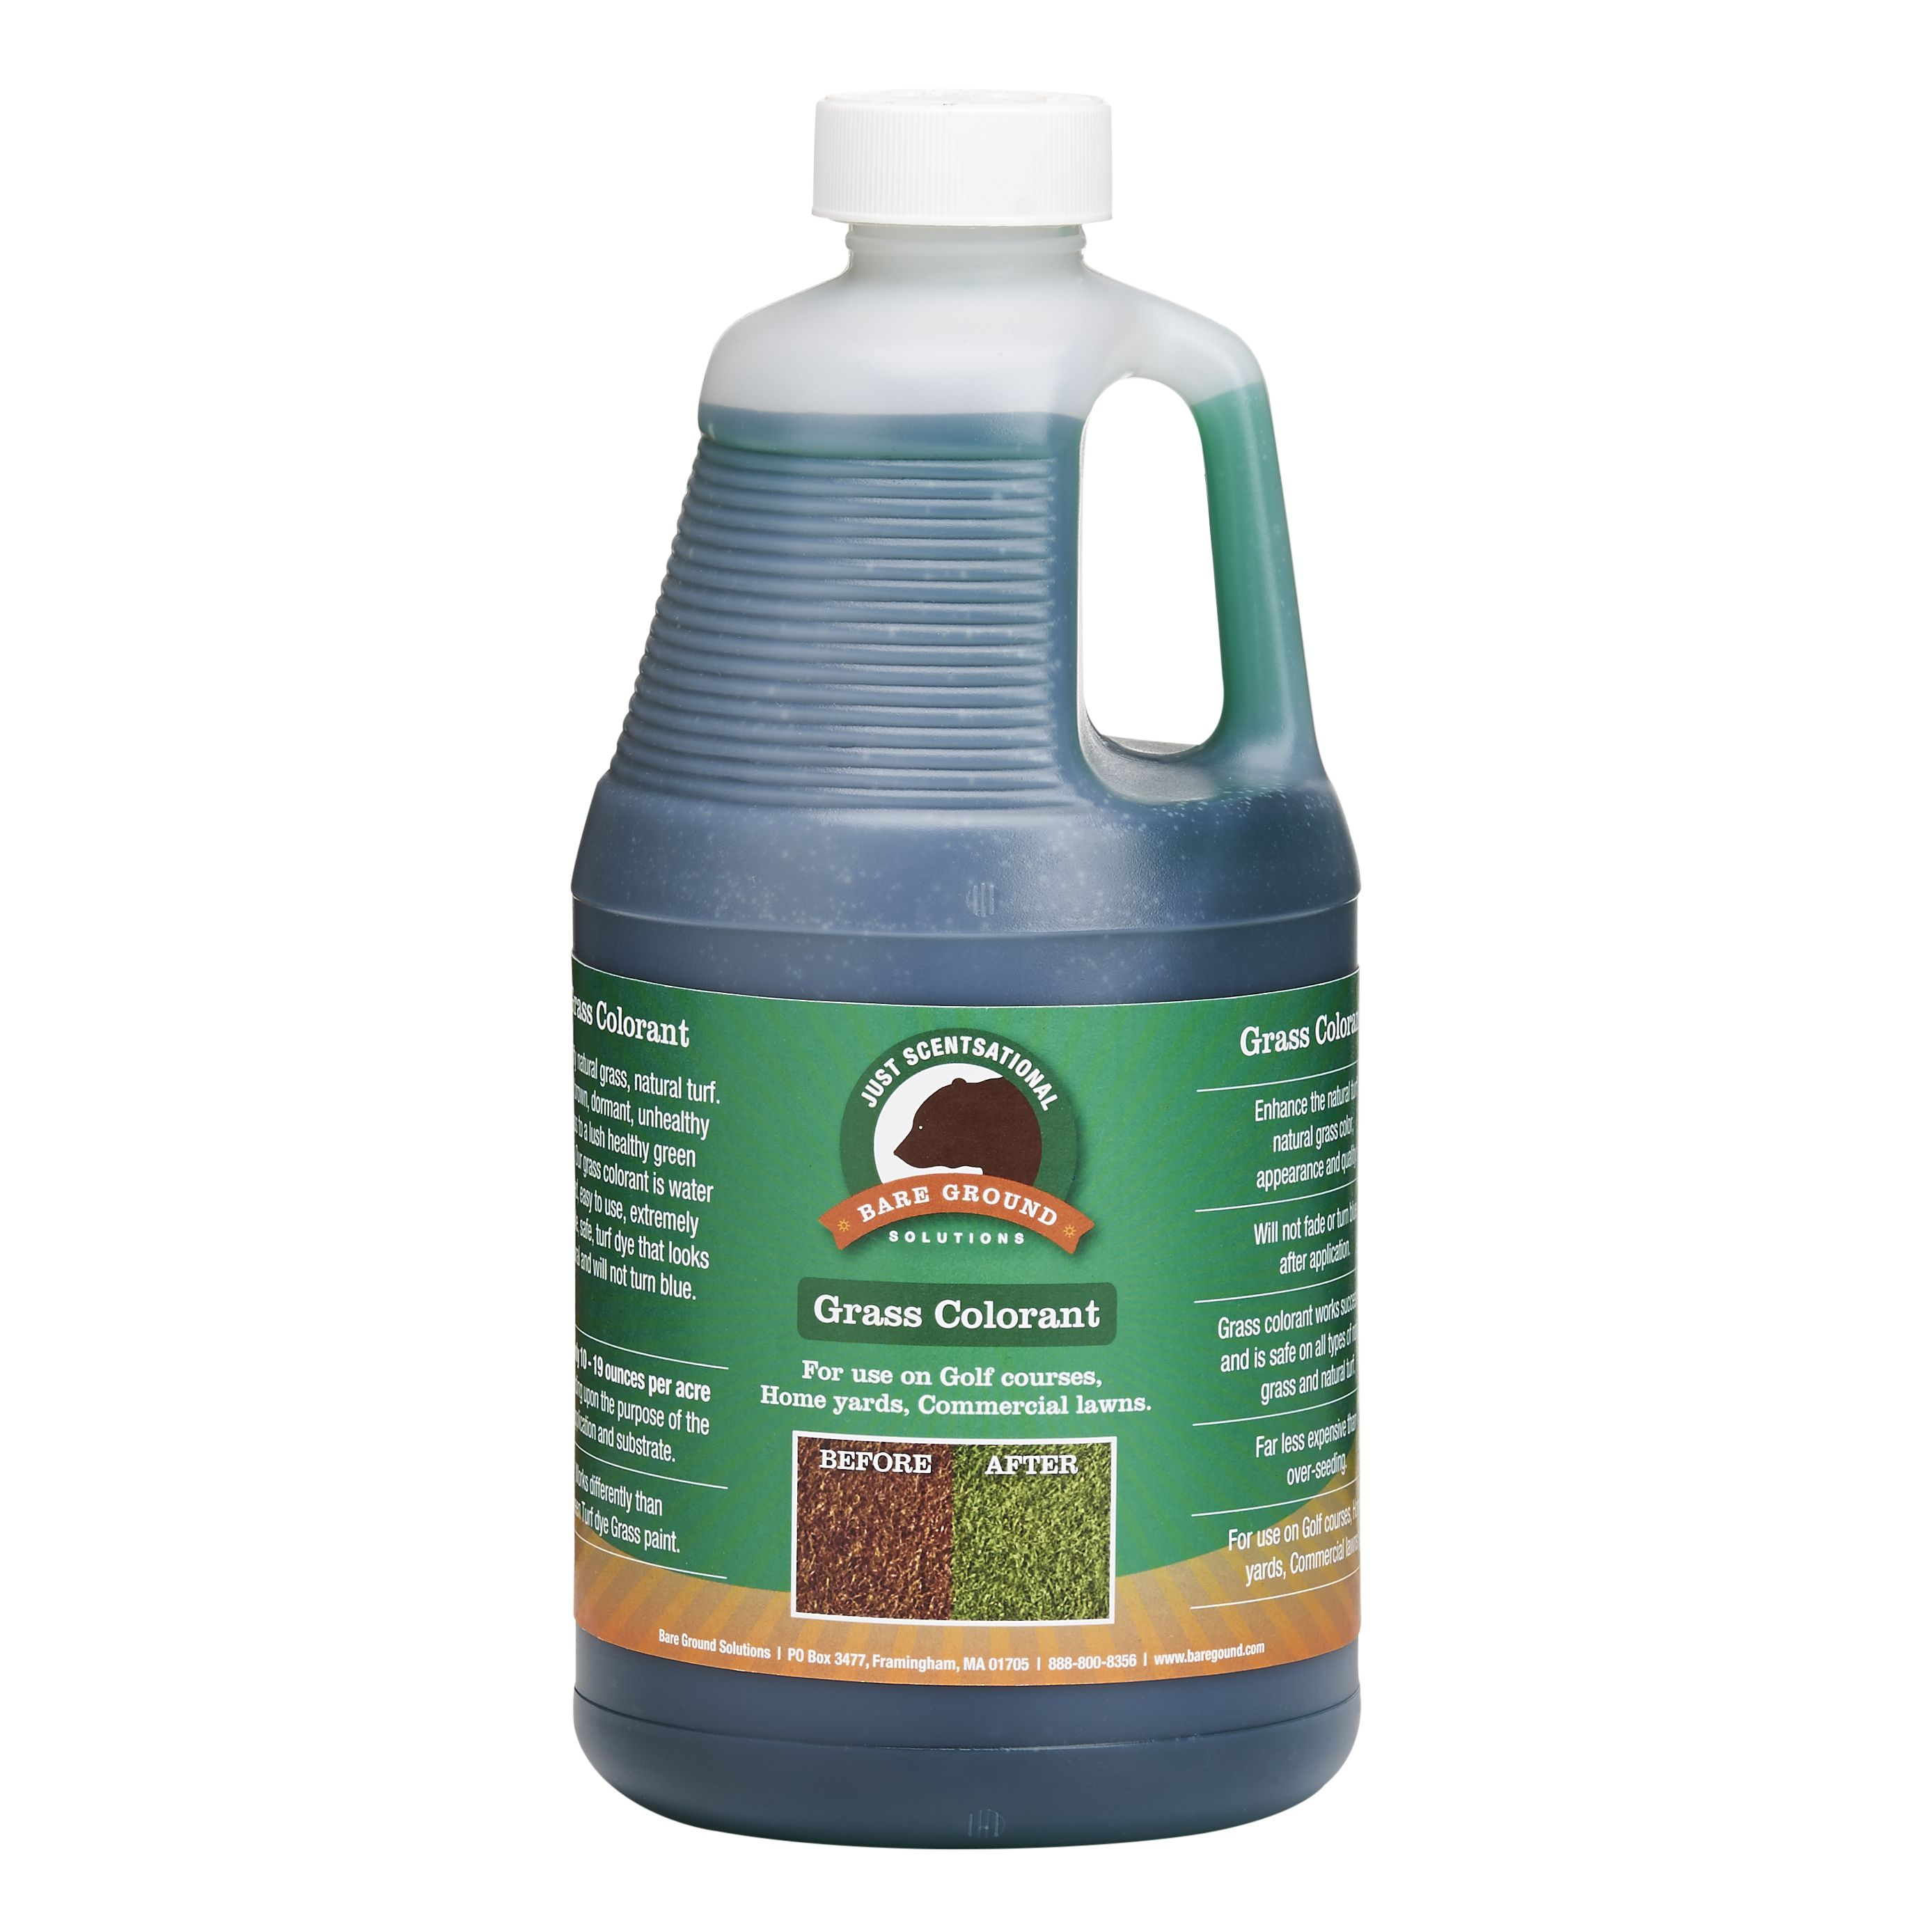 Just Scentsational Green Up Grass Colorant - Half Gallon